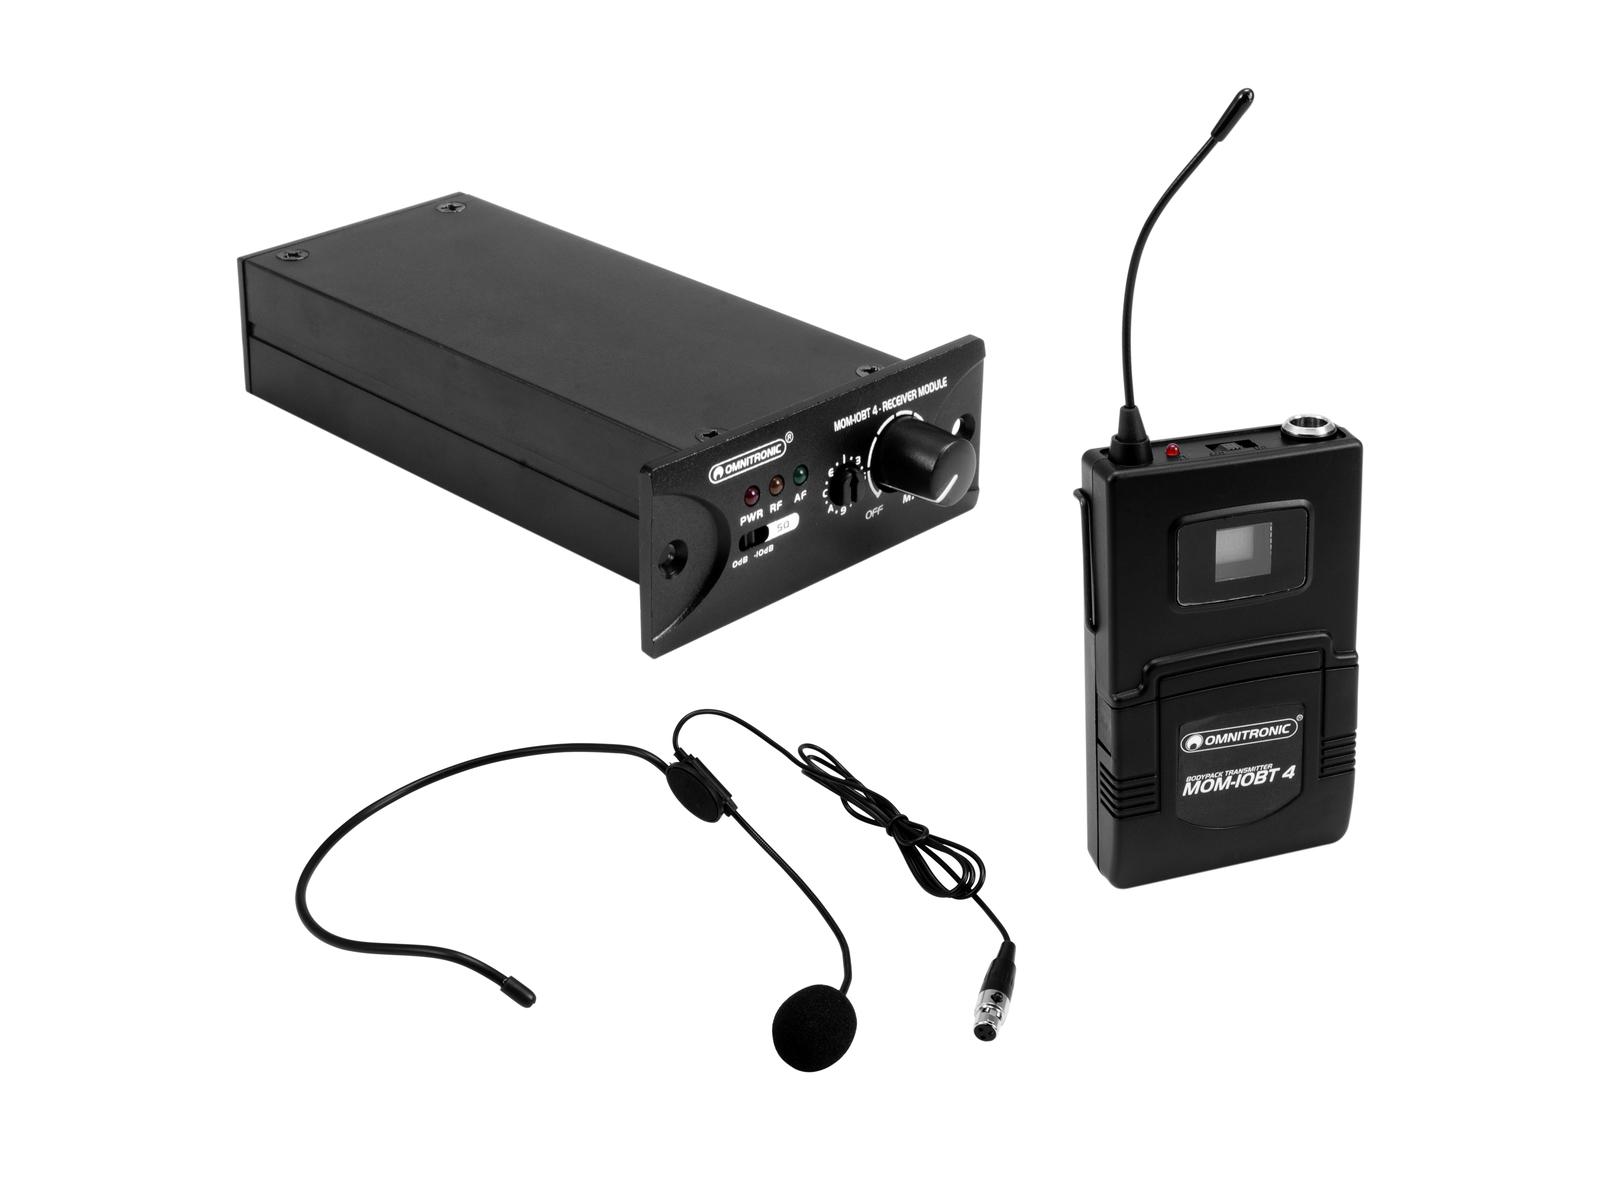 OMNITRONIC Set MOM-10BT4 Empfangsmodul + Taschensender + Headset-Mikrofon